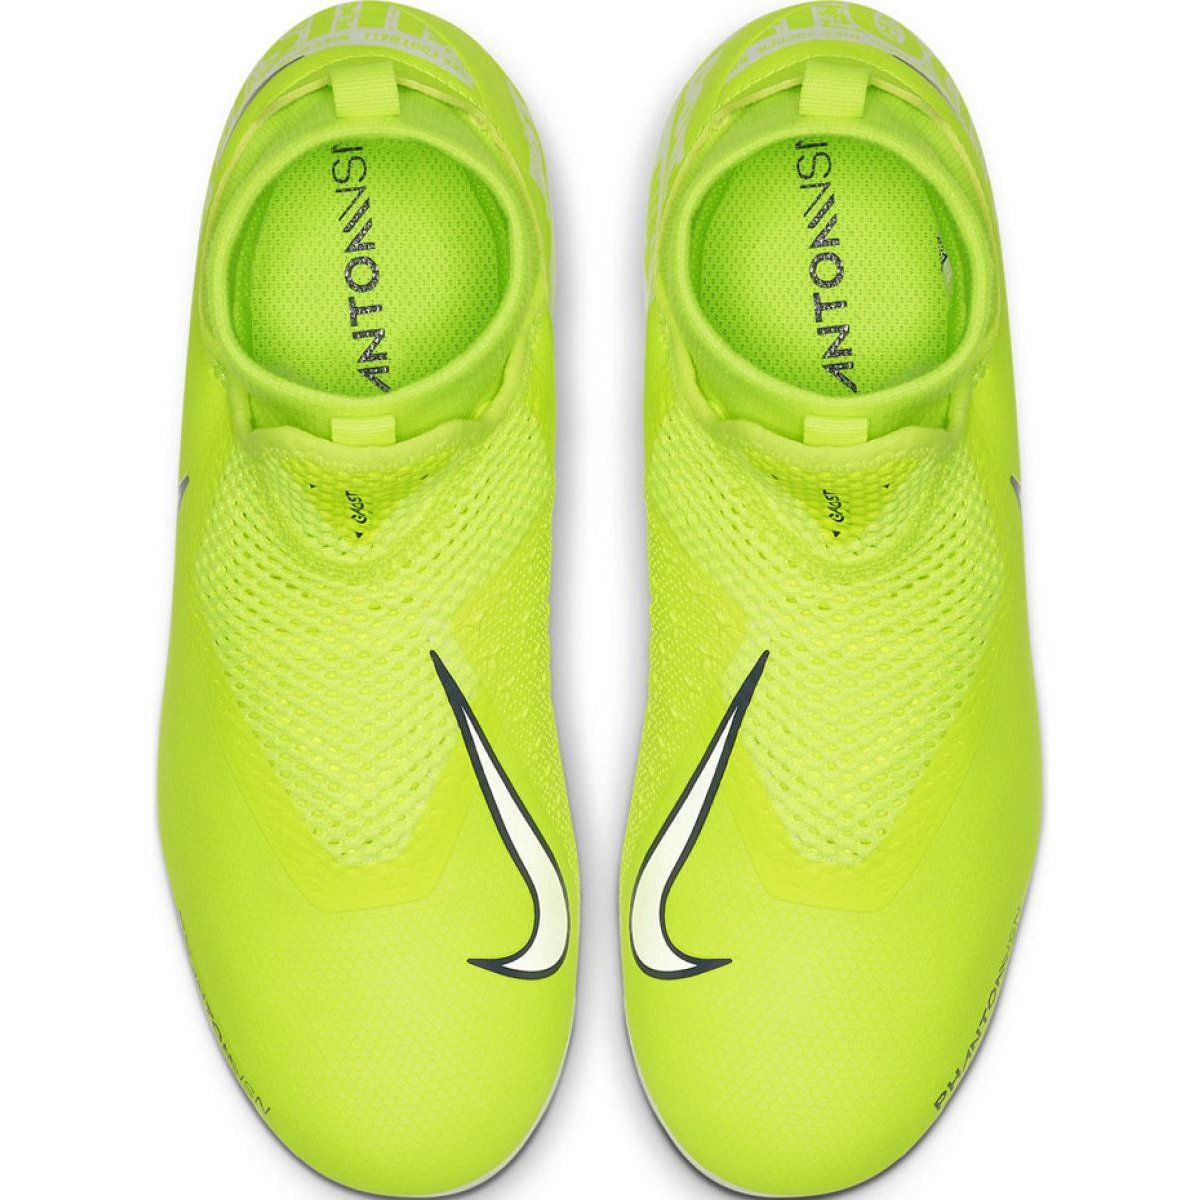 Buty Pilkarskie Nike Phantom Vsn Academy Df Fg Mg Jr Ao3287 717 Zolte Zolte Football Shoes Nike Young Football Players